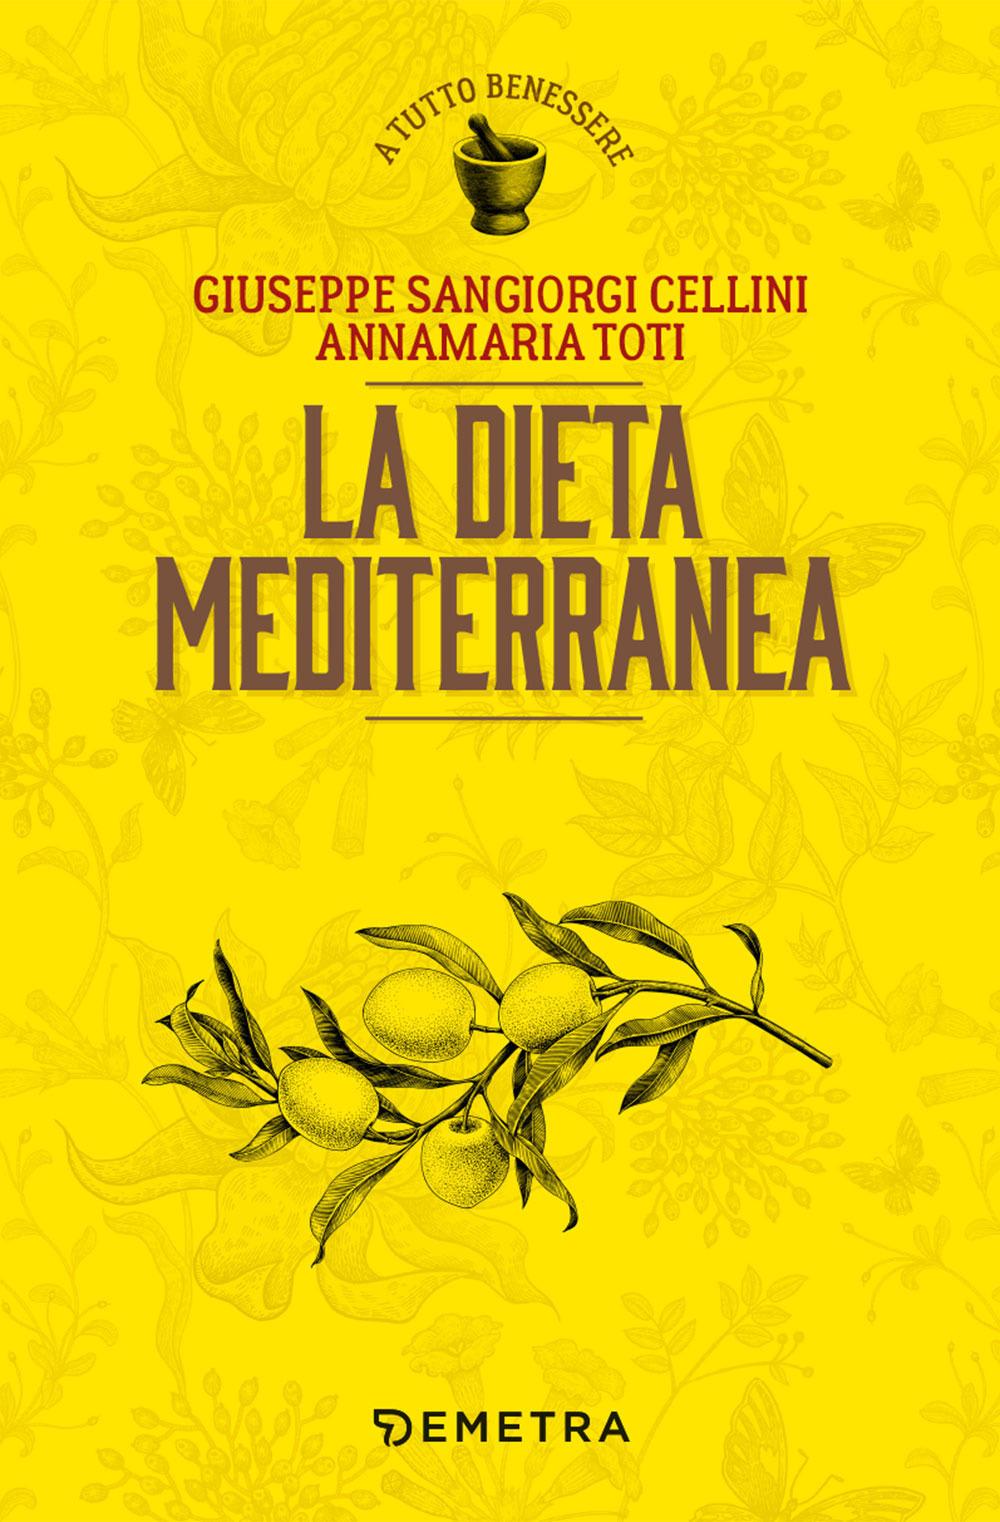 Giuseppe Sangiorgi Cellini;Annamaria Toti La dieta mediterranea Giuseppe Sangiorgi Cellini;Annamaria Toti ISBN:9788844056193